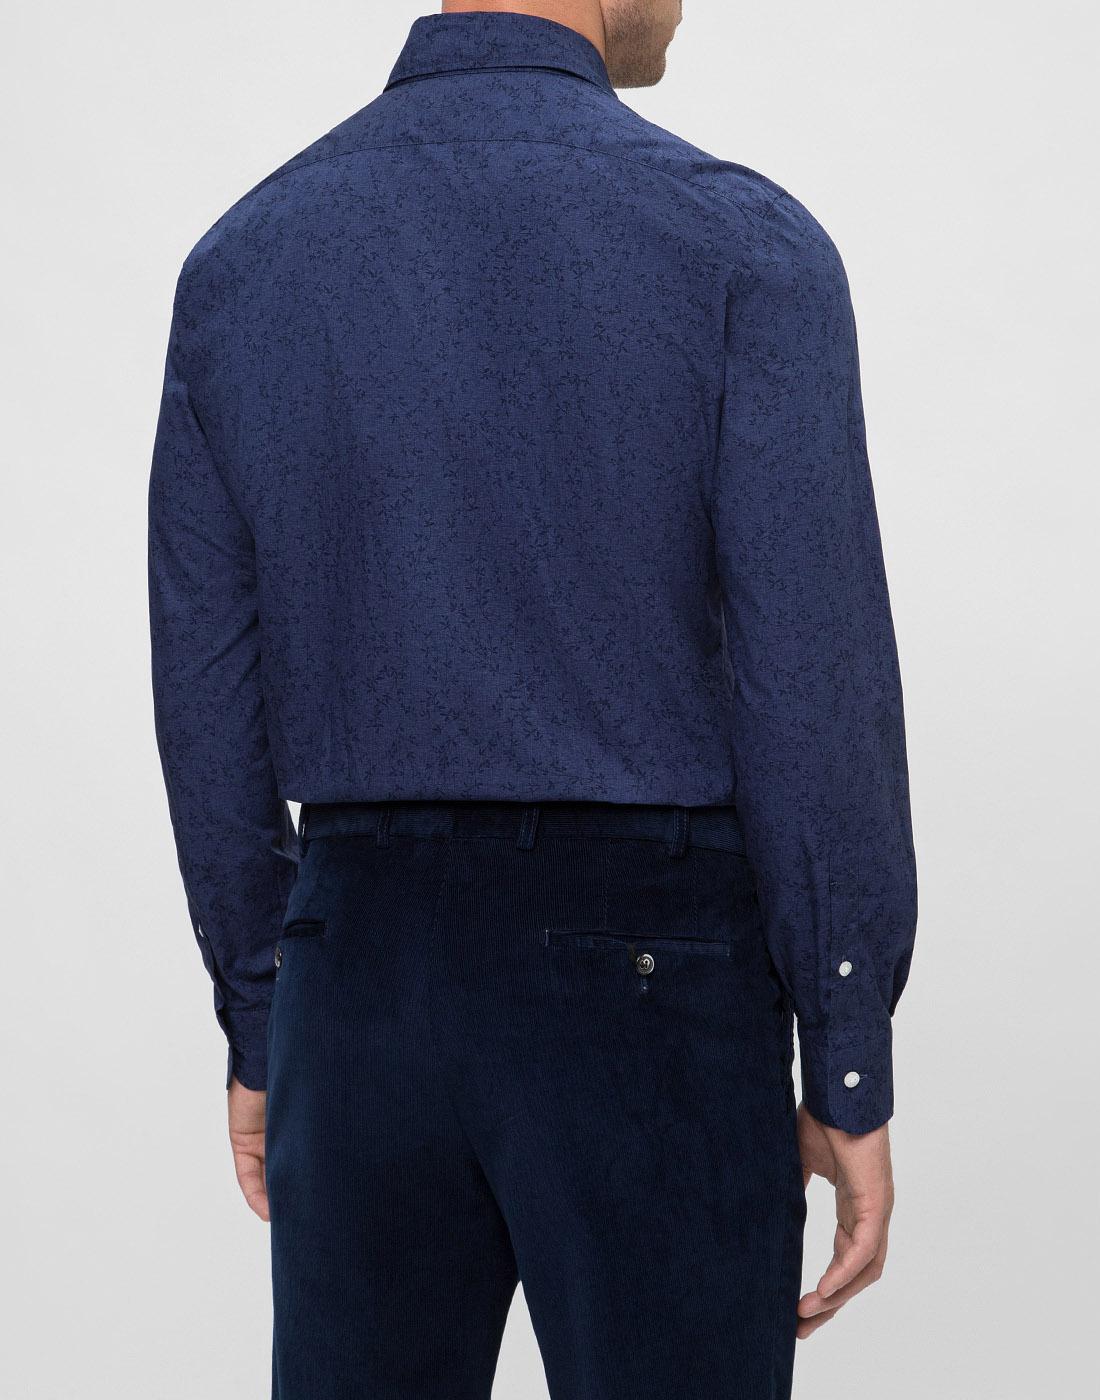 Мужская синяя рубашка Barba S554801U-4